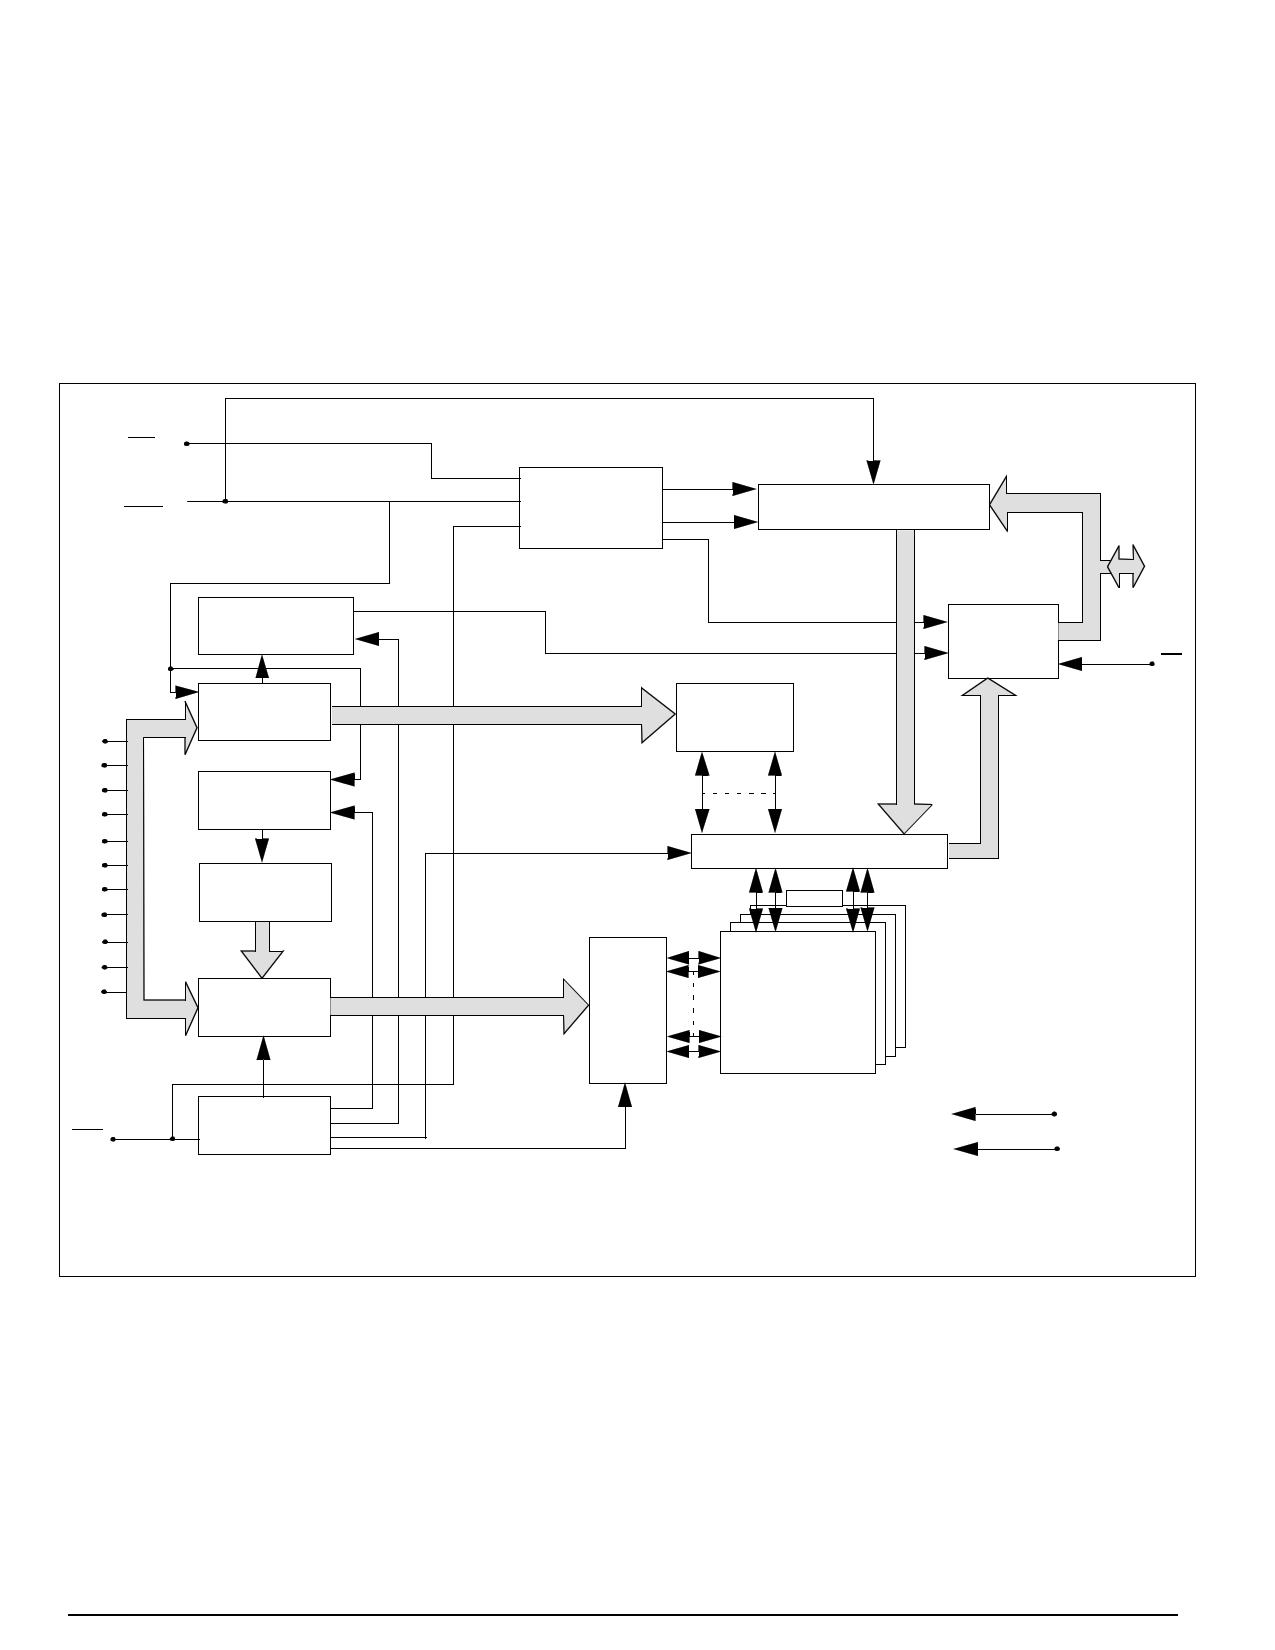 AD401M86RLB-5 equivalent